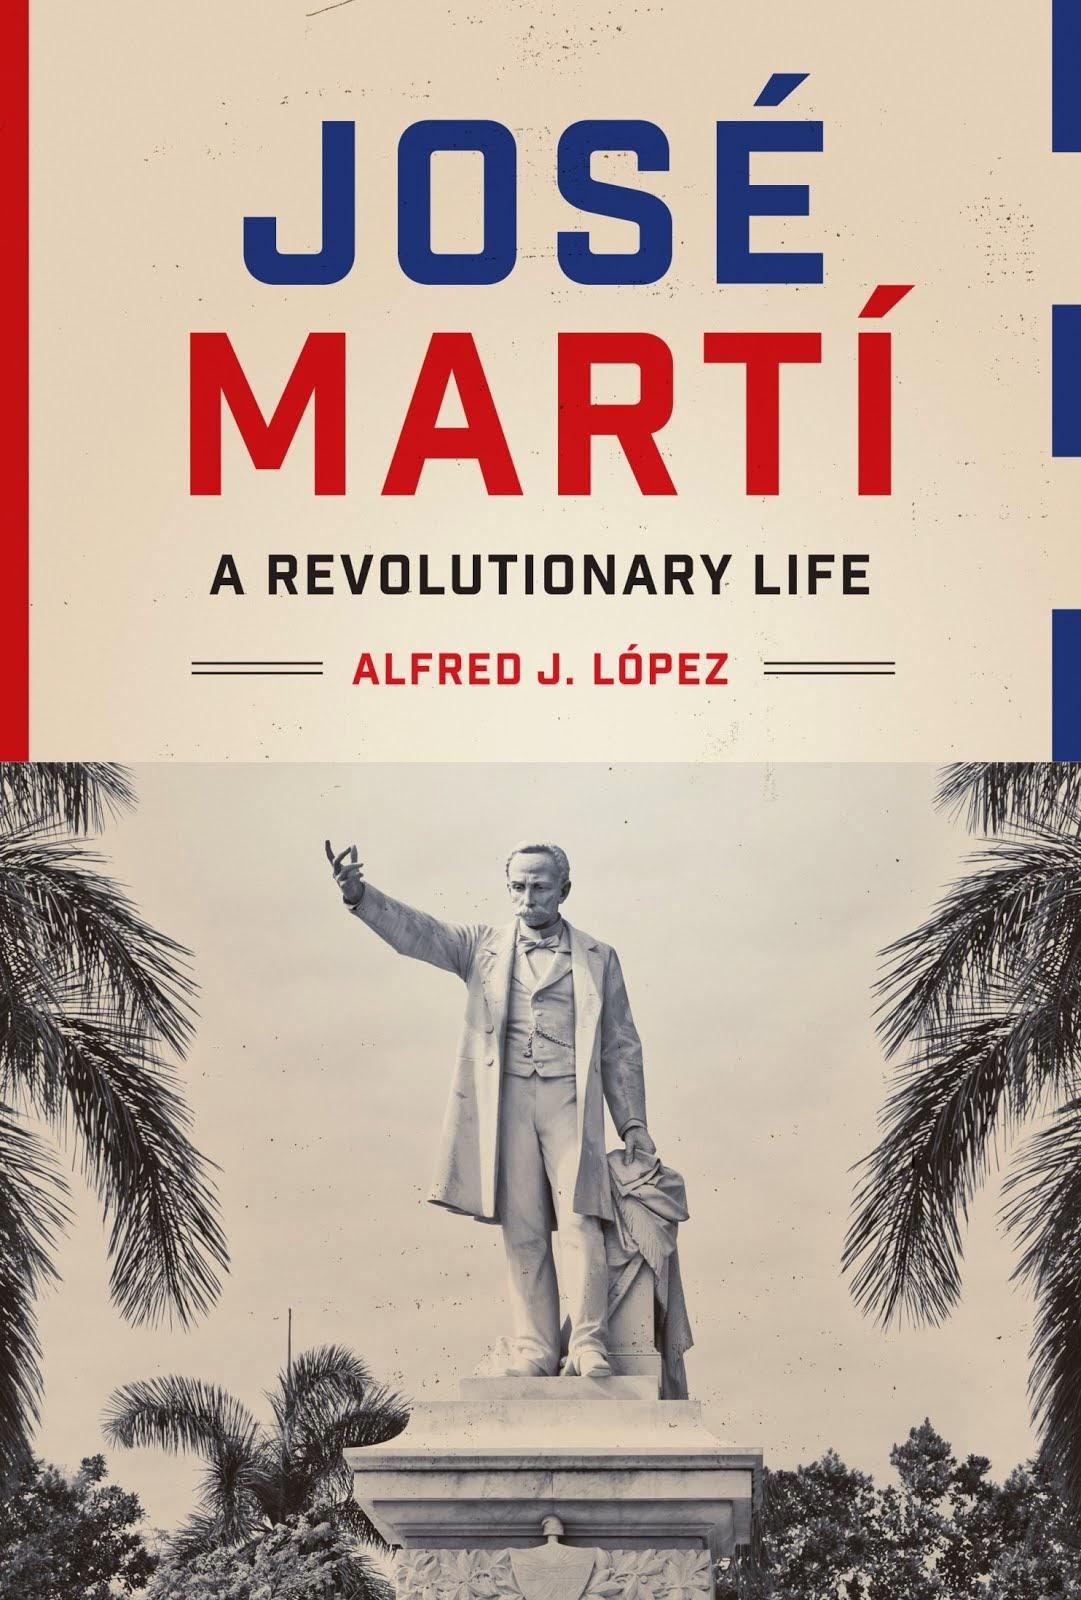 José Martí. A Revolutionary Life